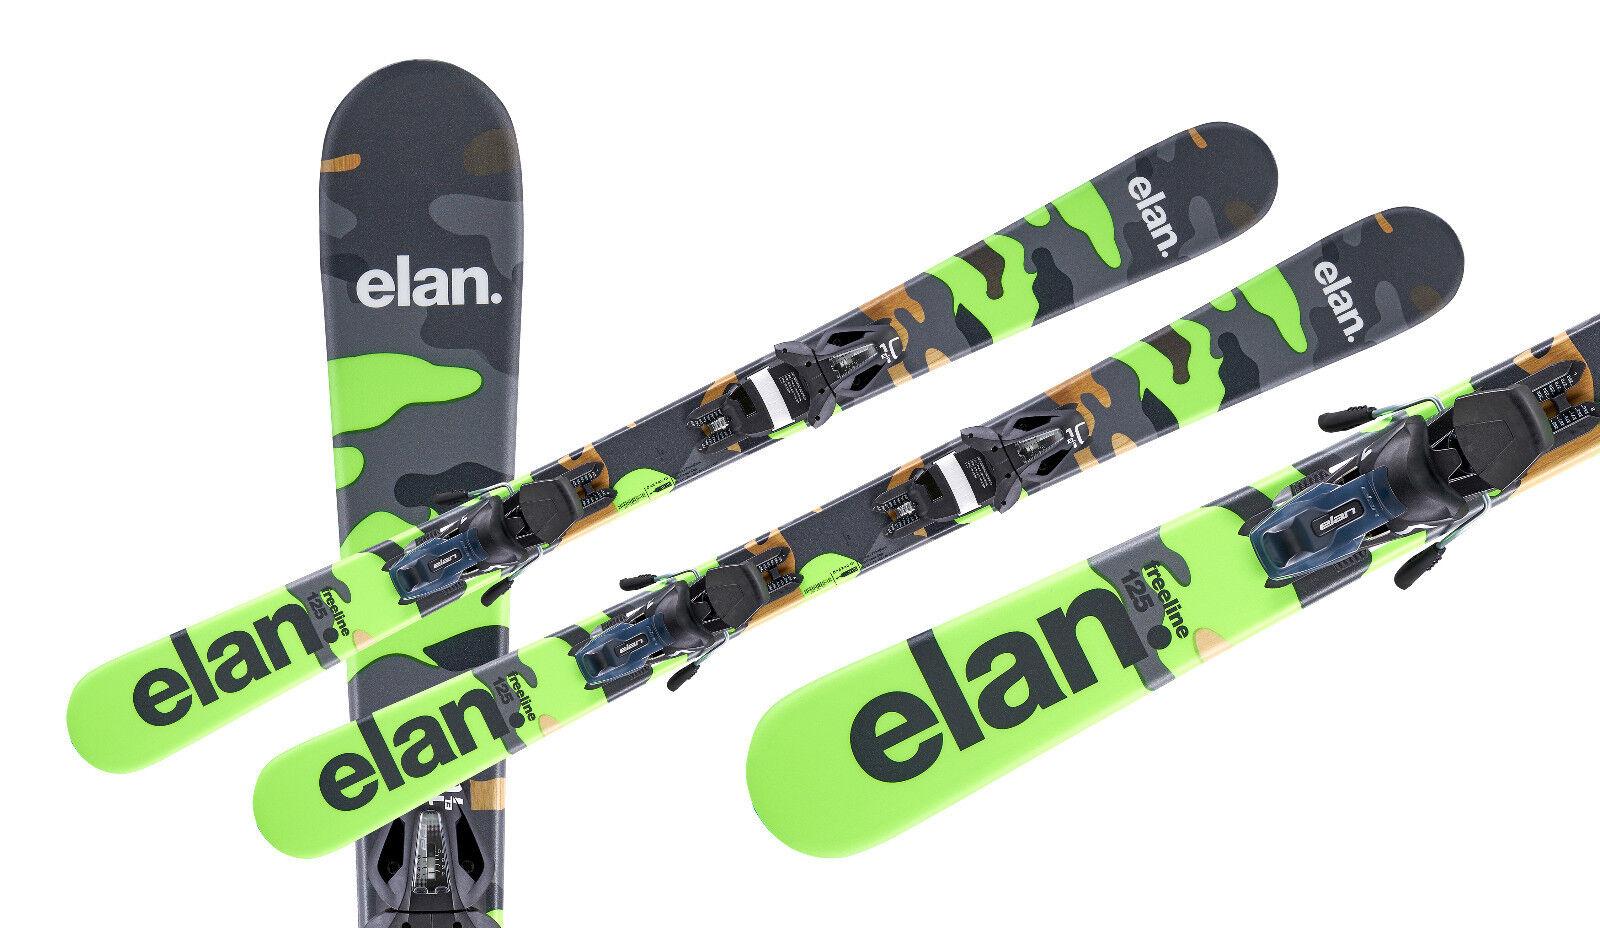 Elan Funcarver Freeline Camo 125cm + EL 10 Sicherheitsbindung Saison 2018/2019